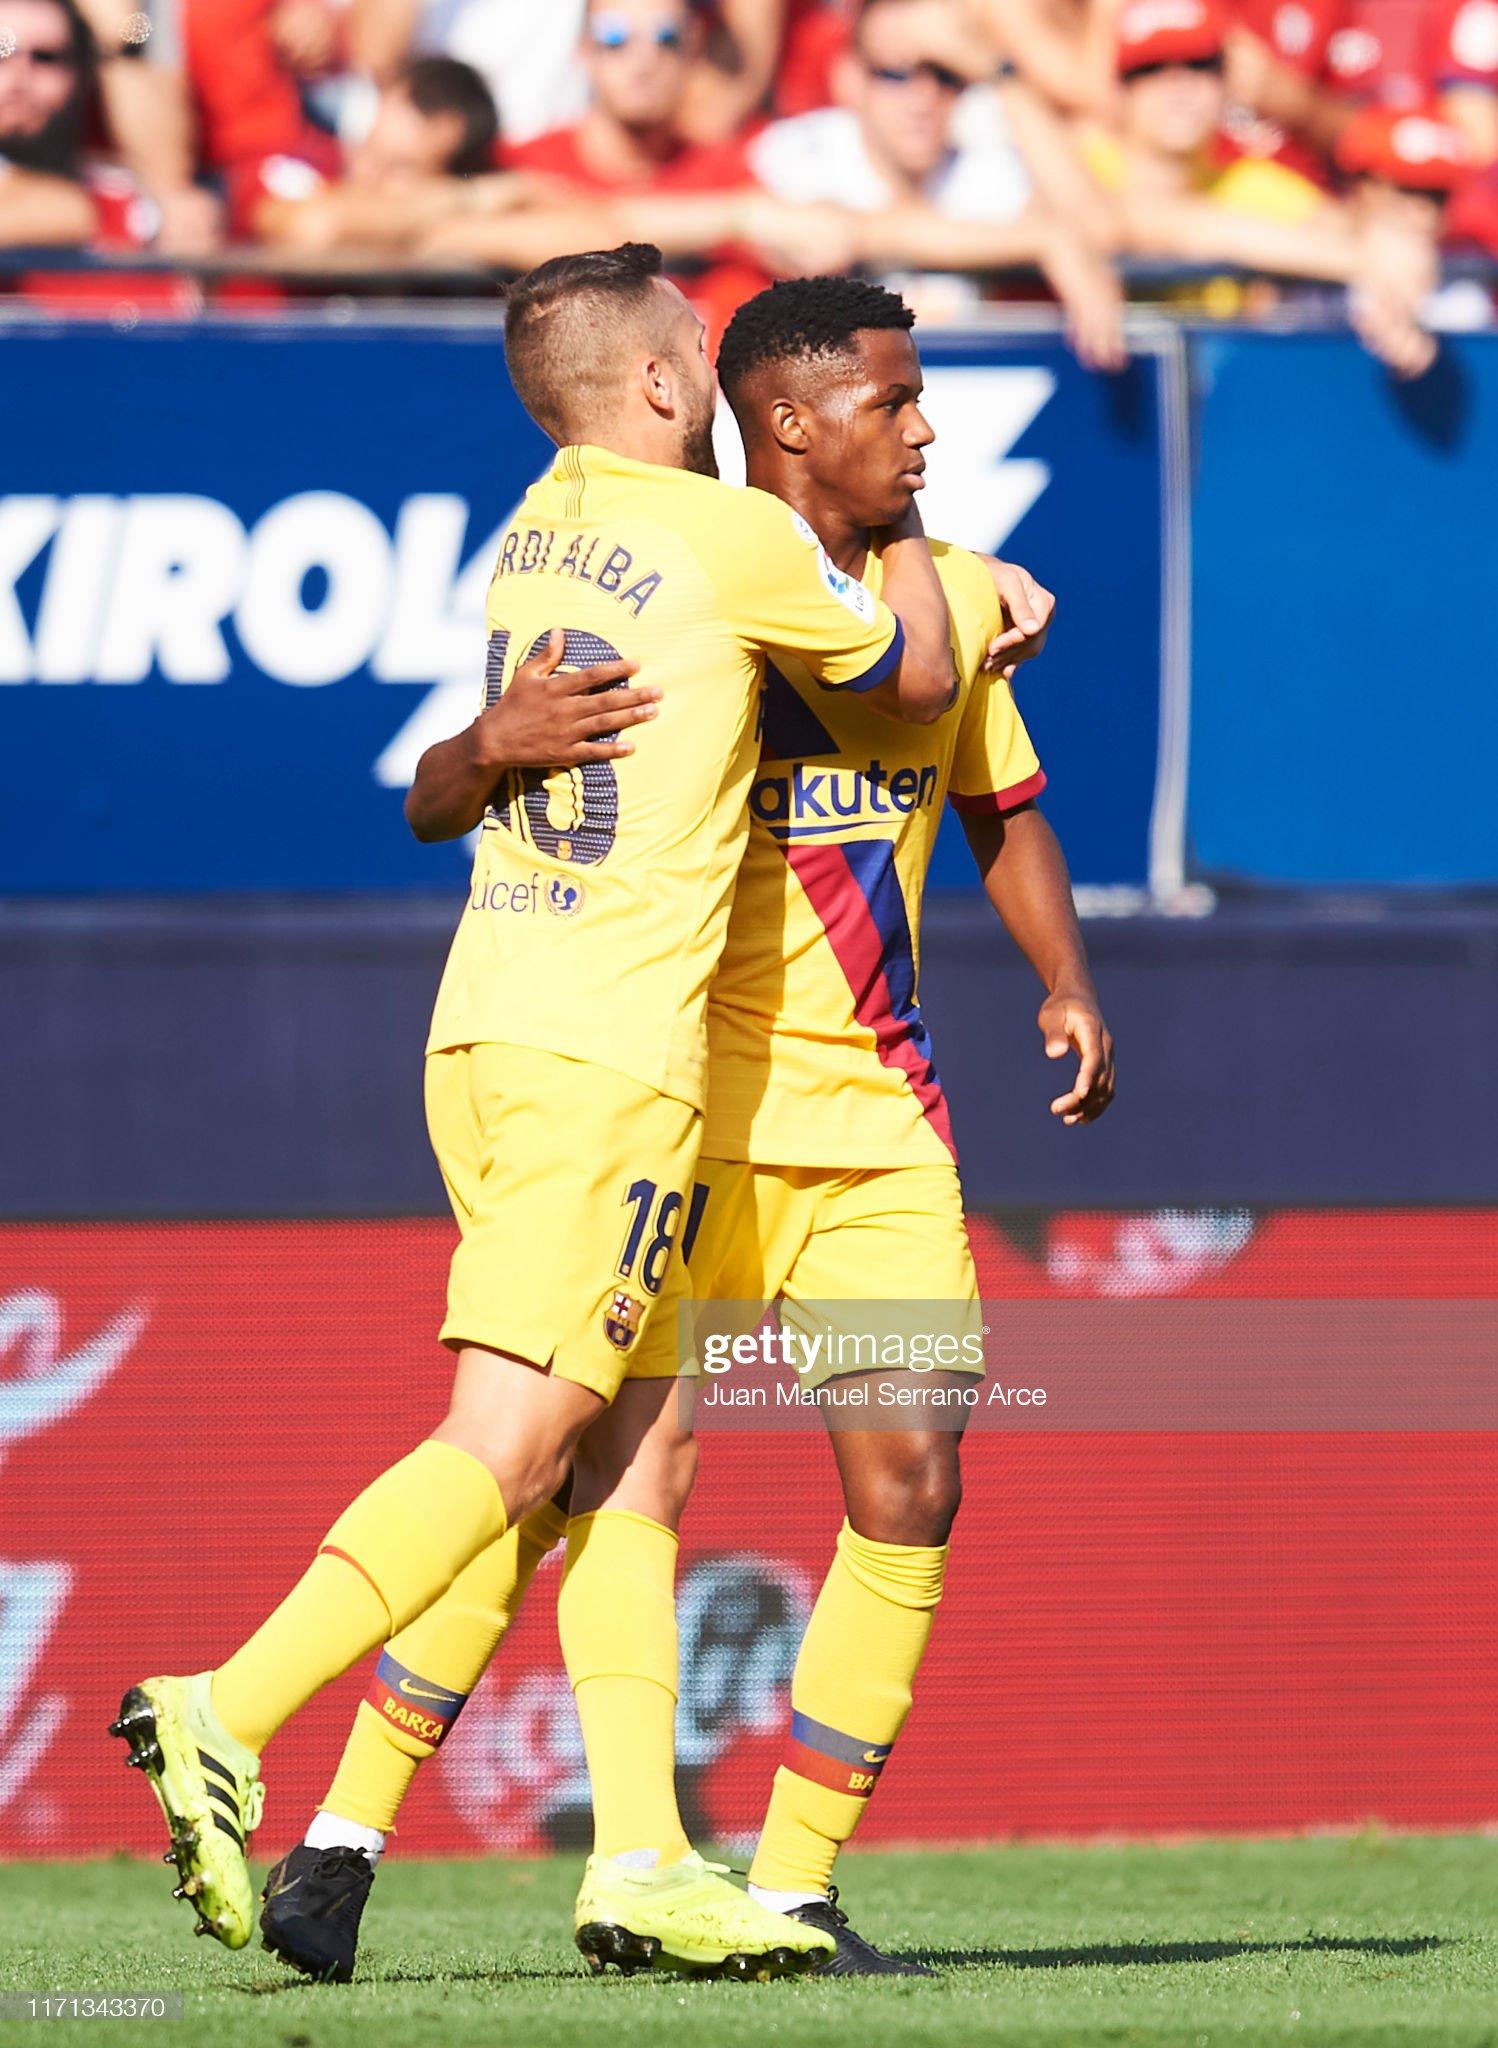 صور مباراة : أوساسونا - برشلونة 2-2 ( 31-08-2019 )  Anssumane-fati-of-fc-barcelona-celebrates-with-teammate-jordi-alba-picture-id1171343370?s=2048x2048